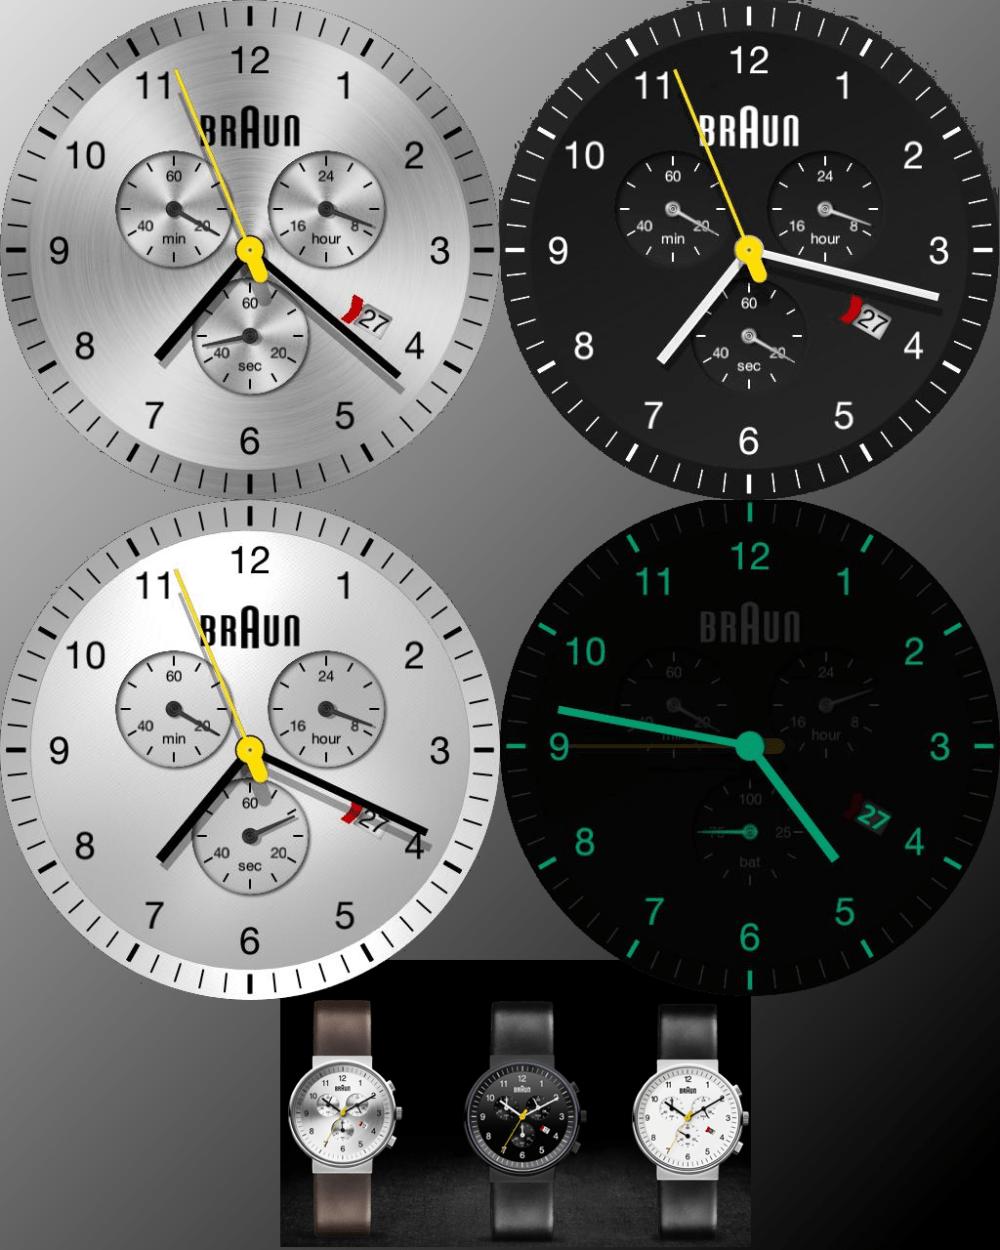 BRAUN Chronograph black/silver/white bn0035